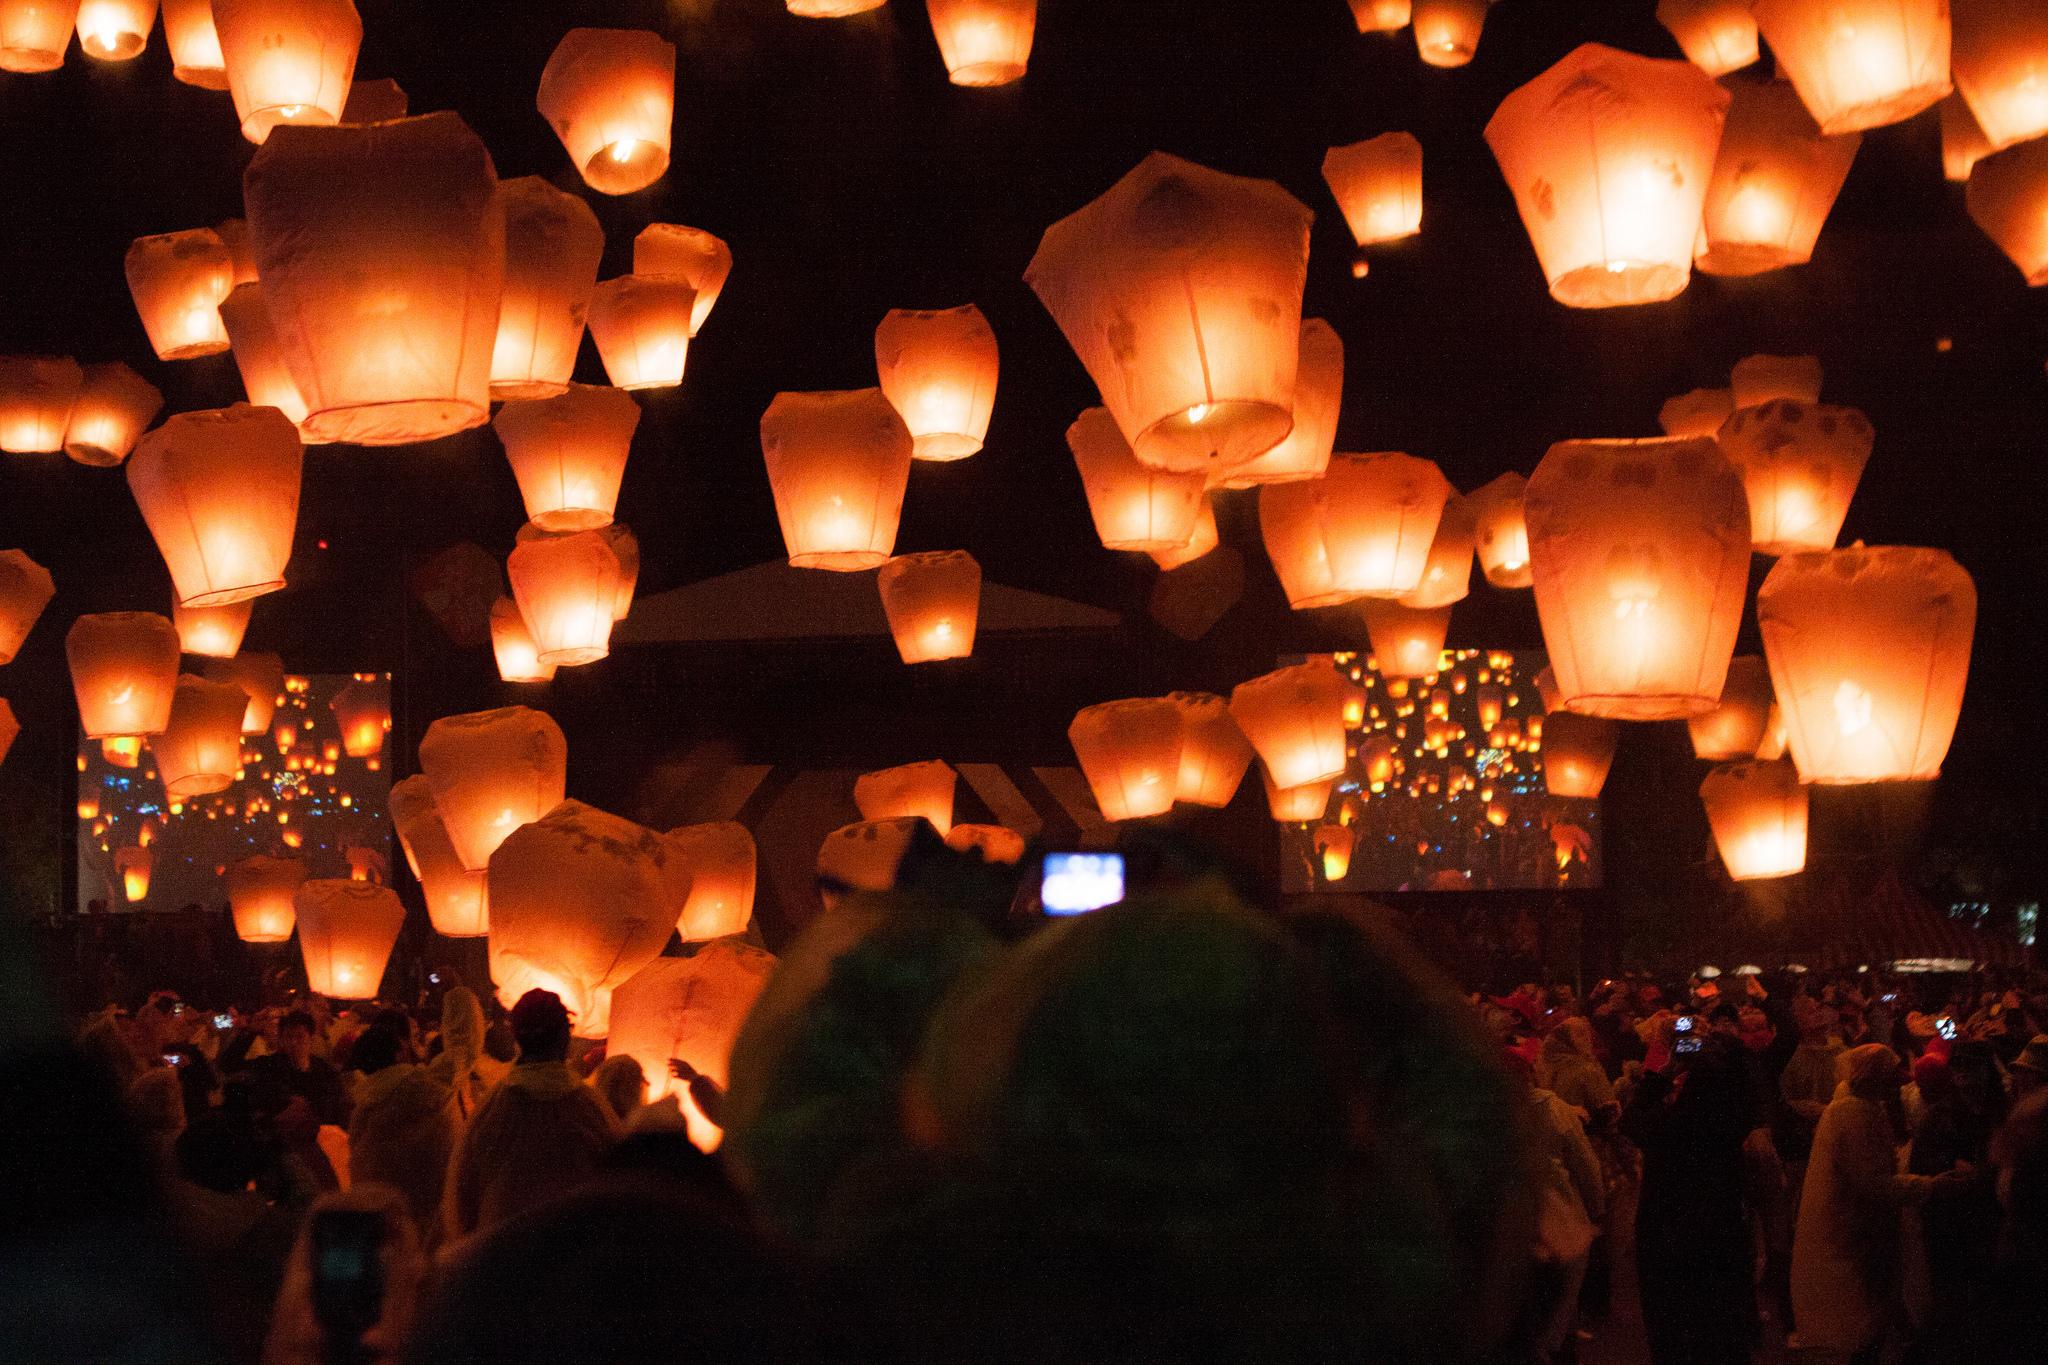 Pingxi Sky Lantern Festival © Jirka Matousek/Flickr